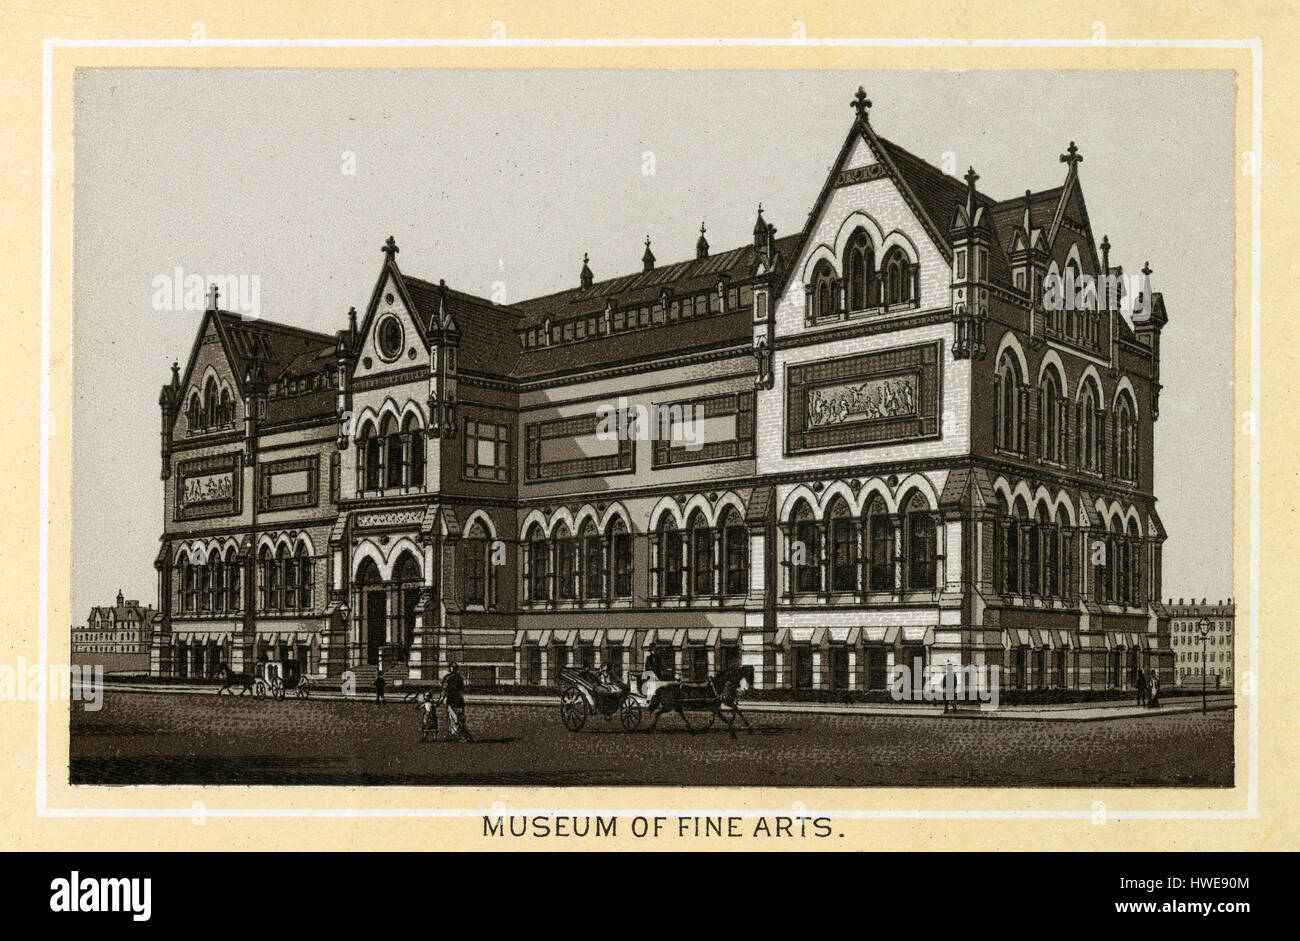 Antique 1883 monochromatic print from a souvenir album, showing the original Museum of Fine Arts building in Boston, - Stock Image